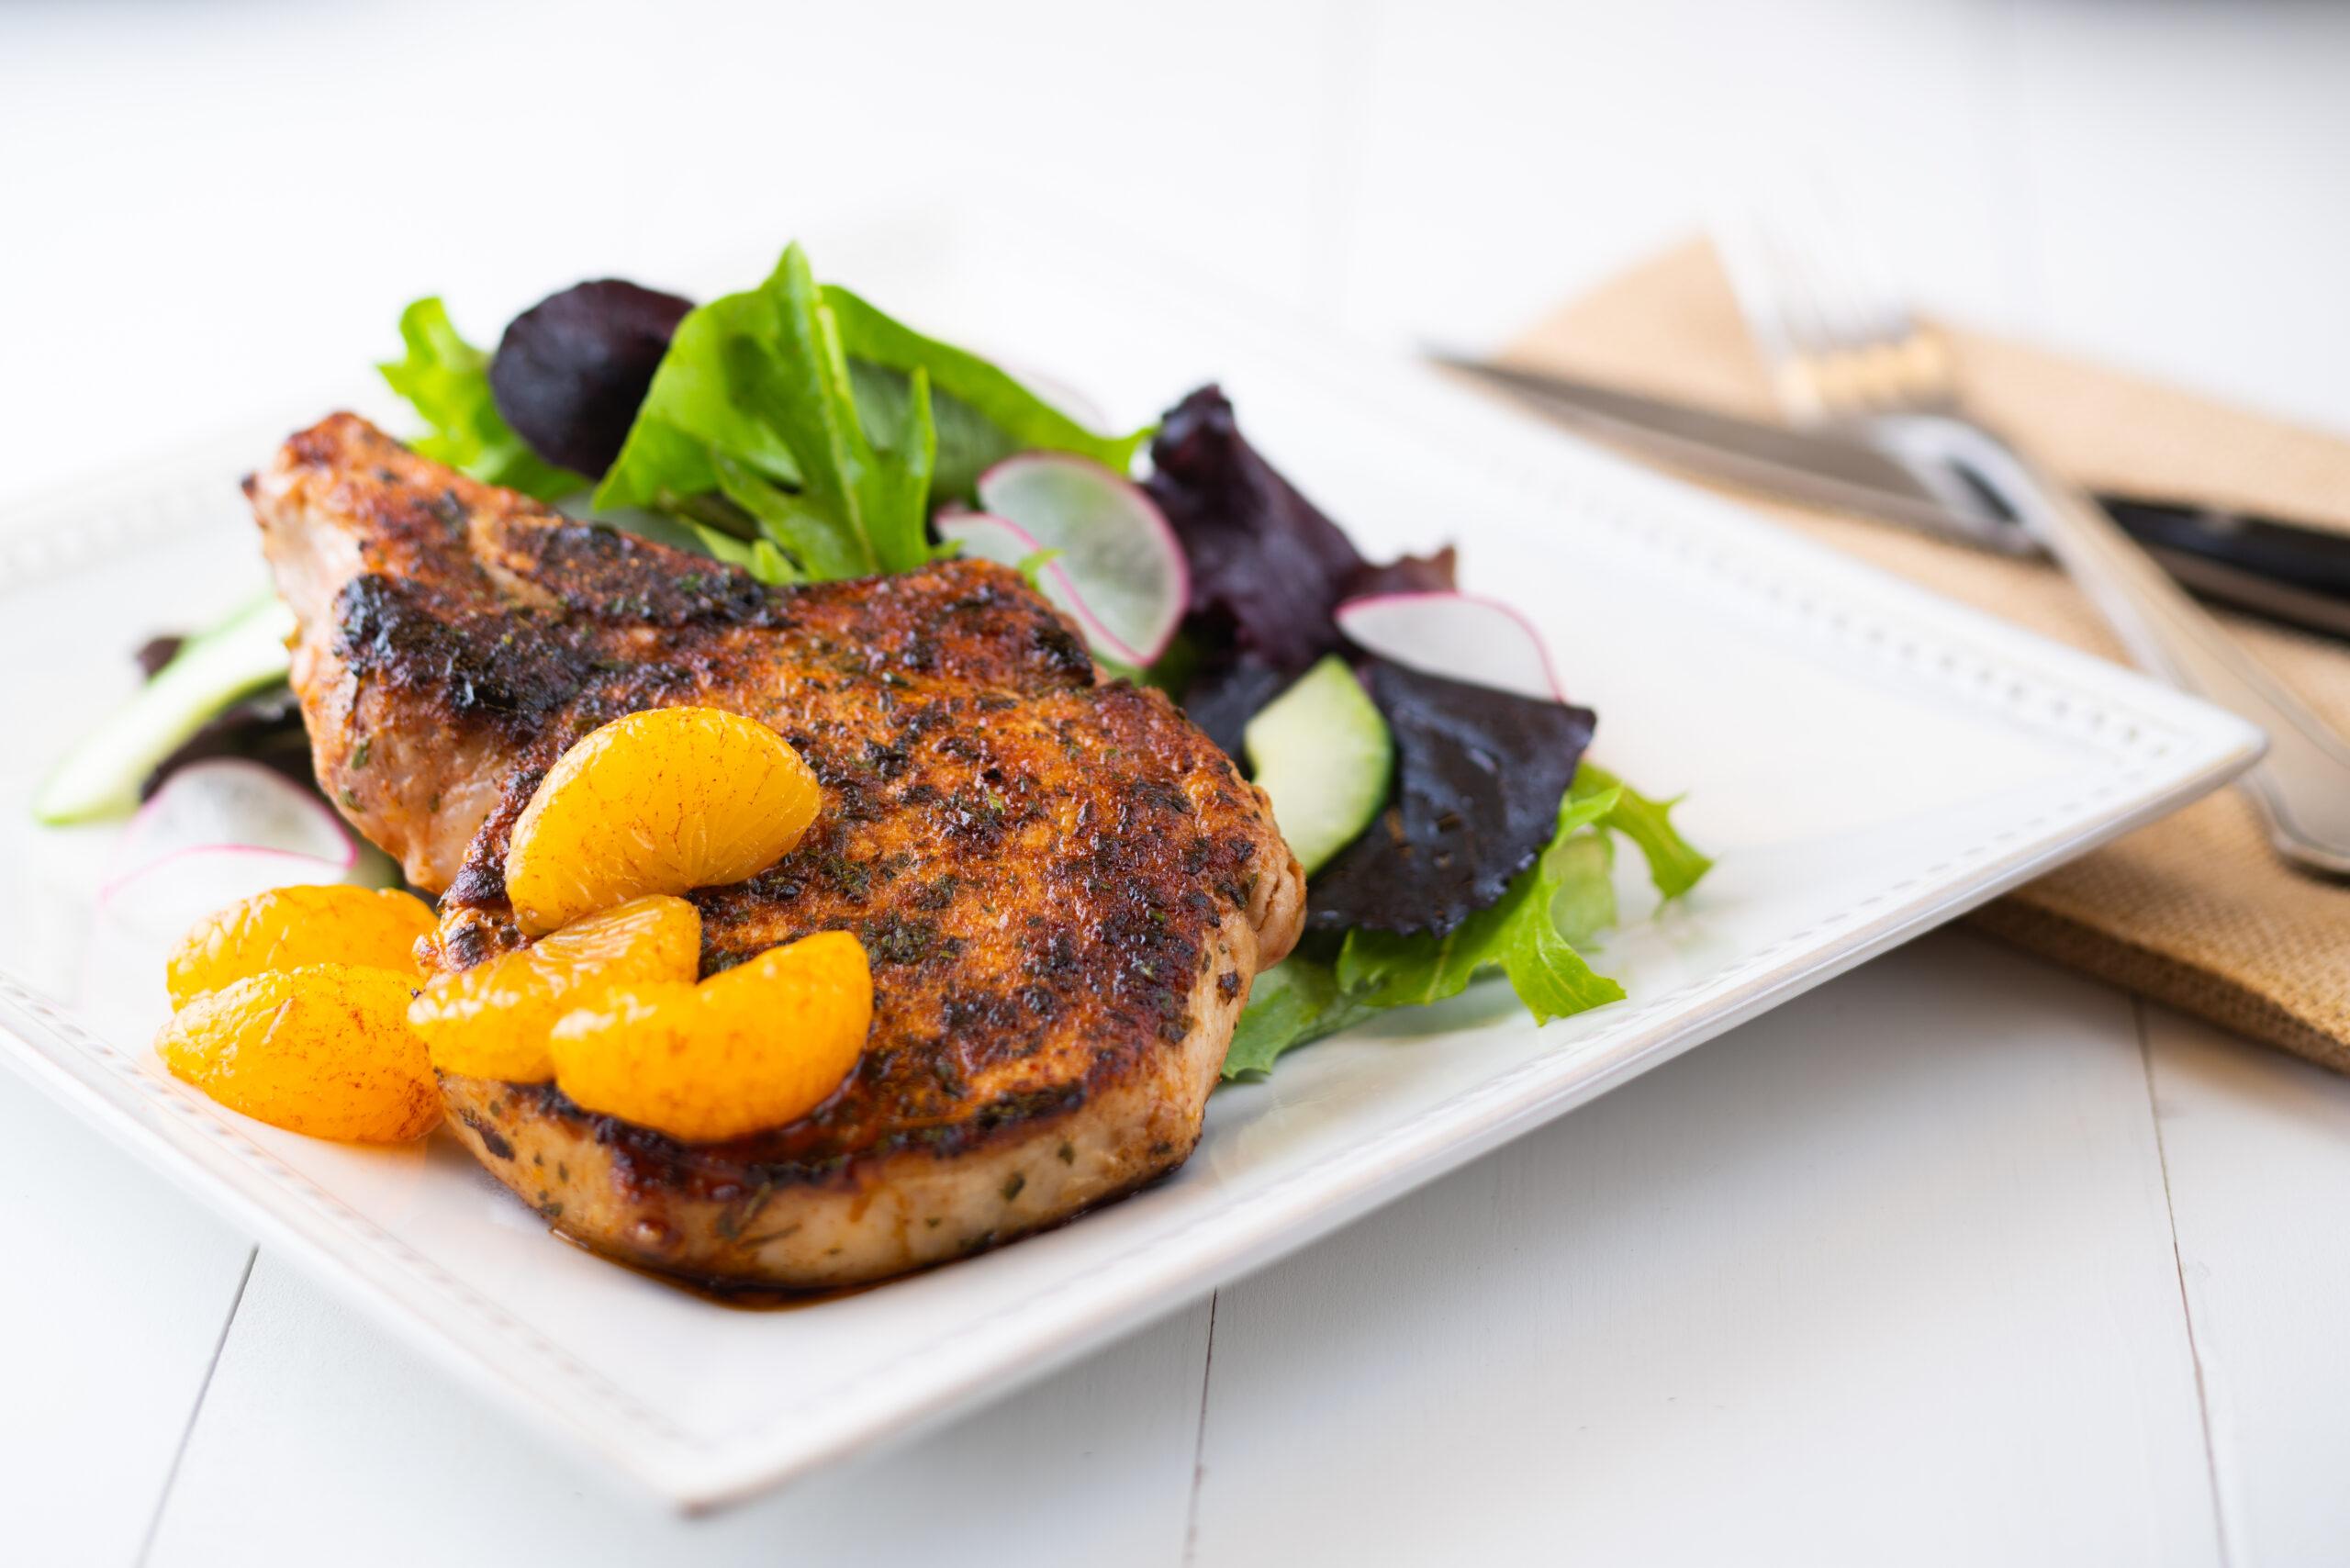 Six Spice Pork Chops with Cinnamon Oranges – Salt-Free Sugar-Free Magic Seasoning Blends™